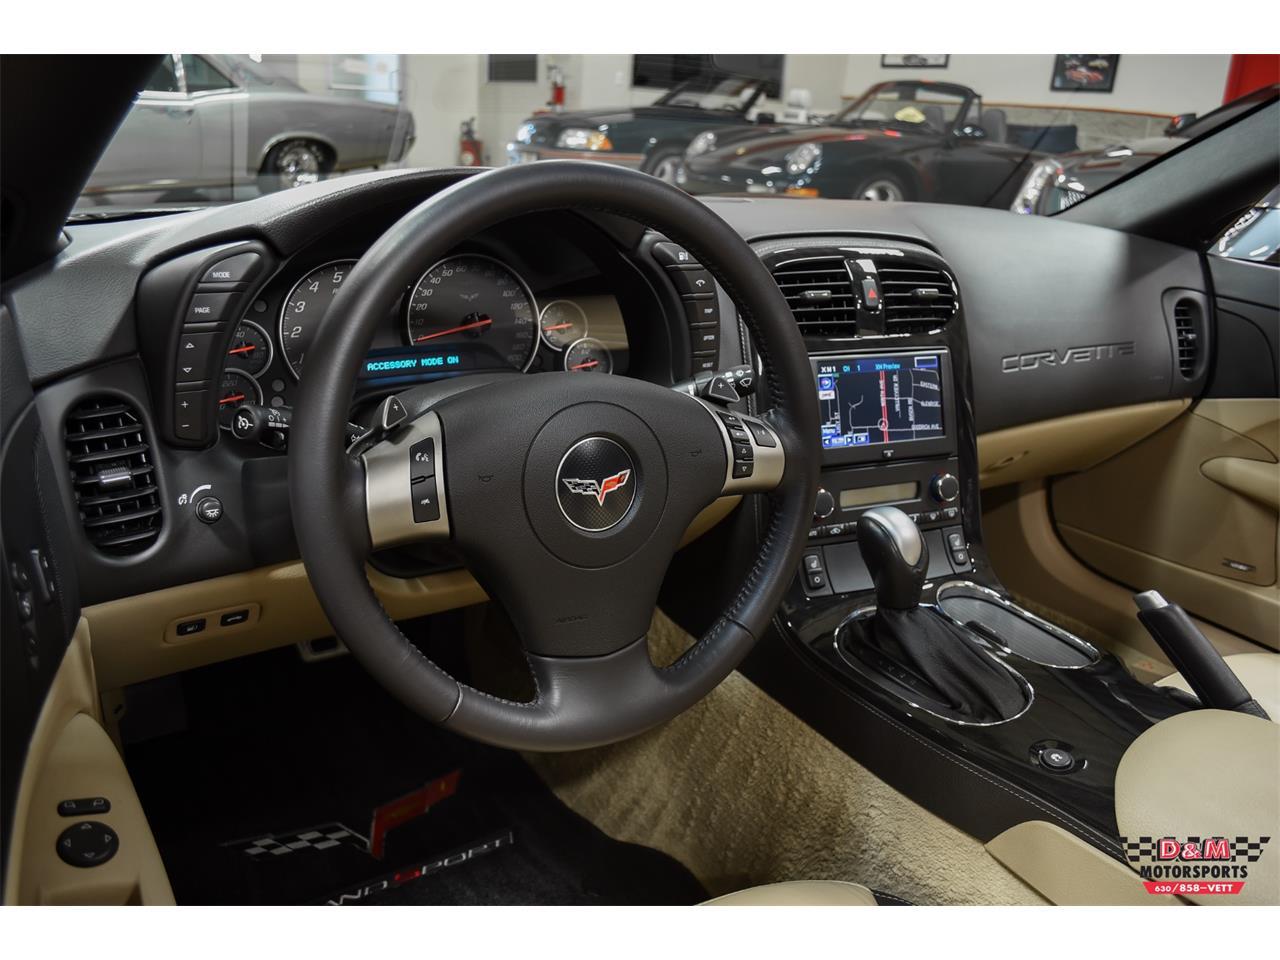 Large Picture of 2010 Corvette located in Illinois - $37,995.00 - PUJ0